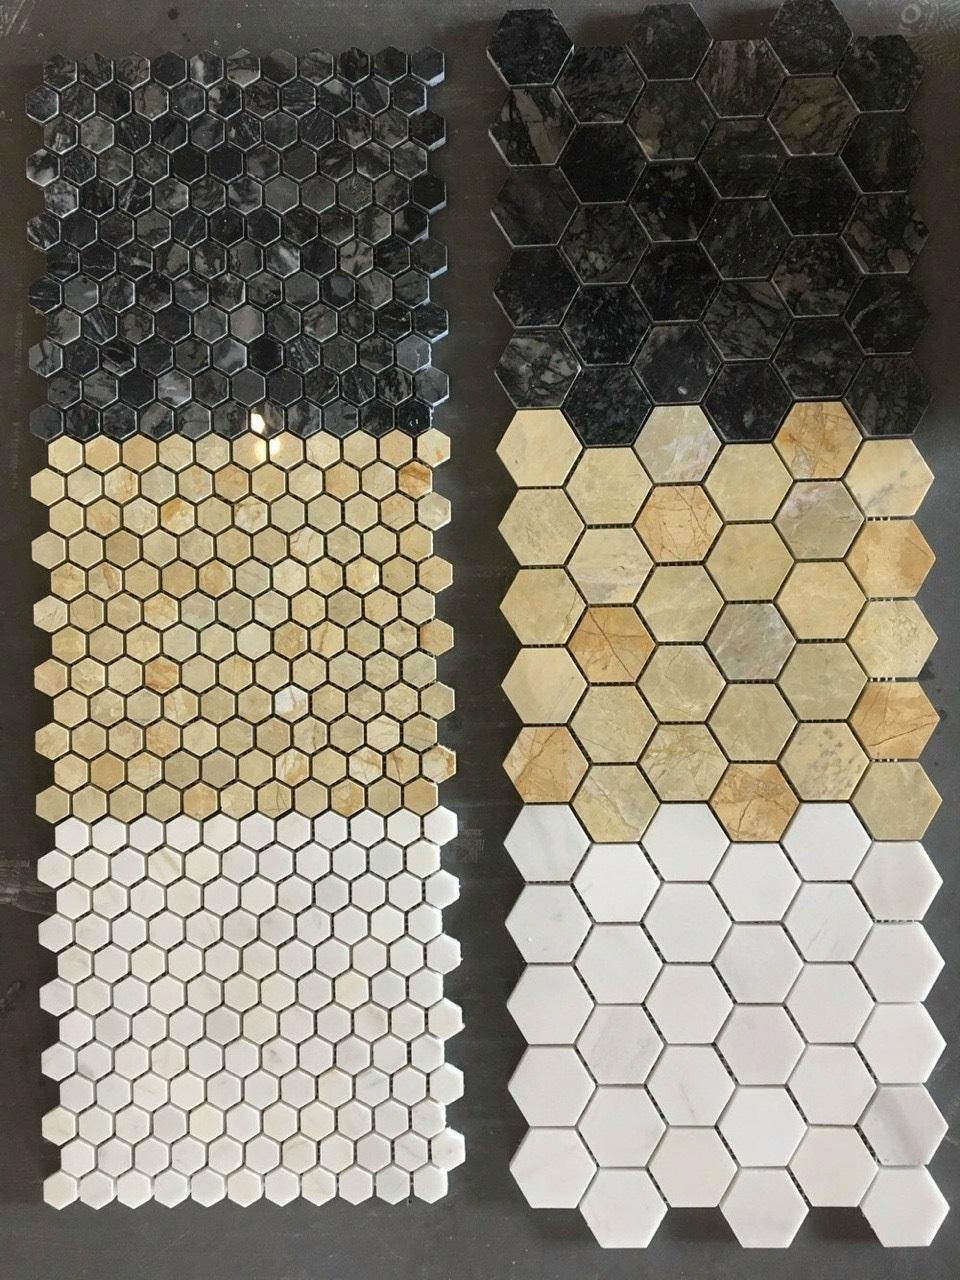 da mosaic hinh luc giac to ong mau vang